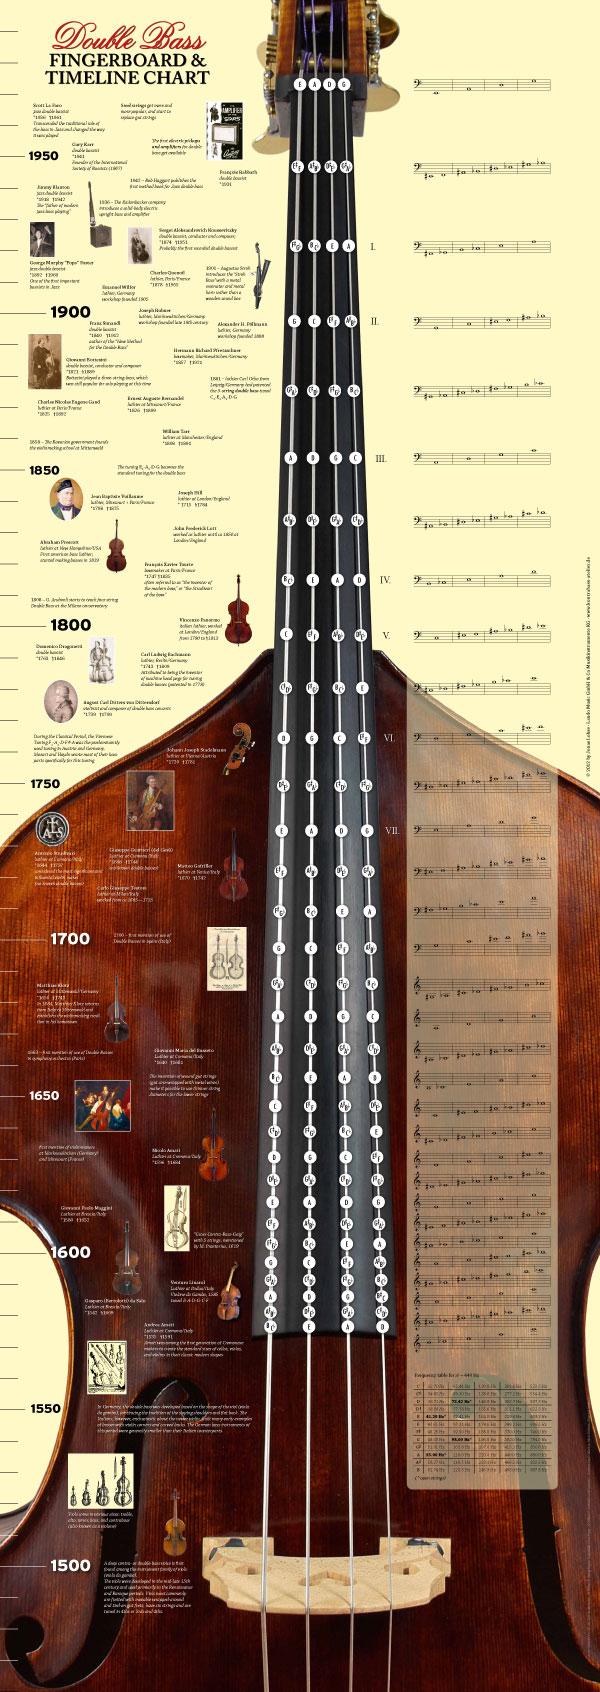 Double Bass Fingerboard & Timeline Chart Grifftabelle_KB_large